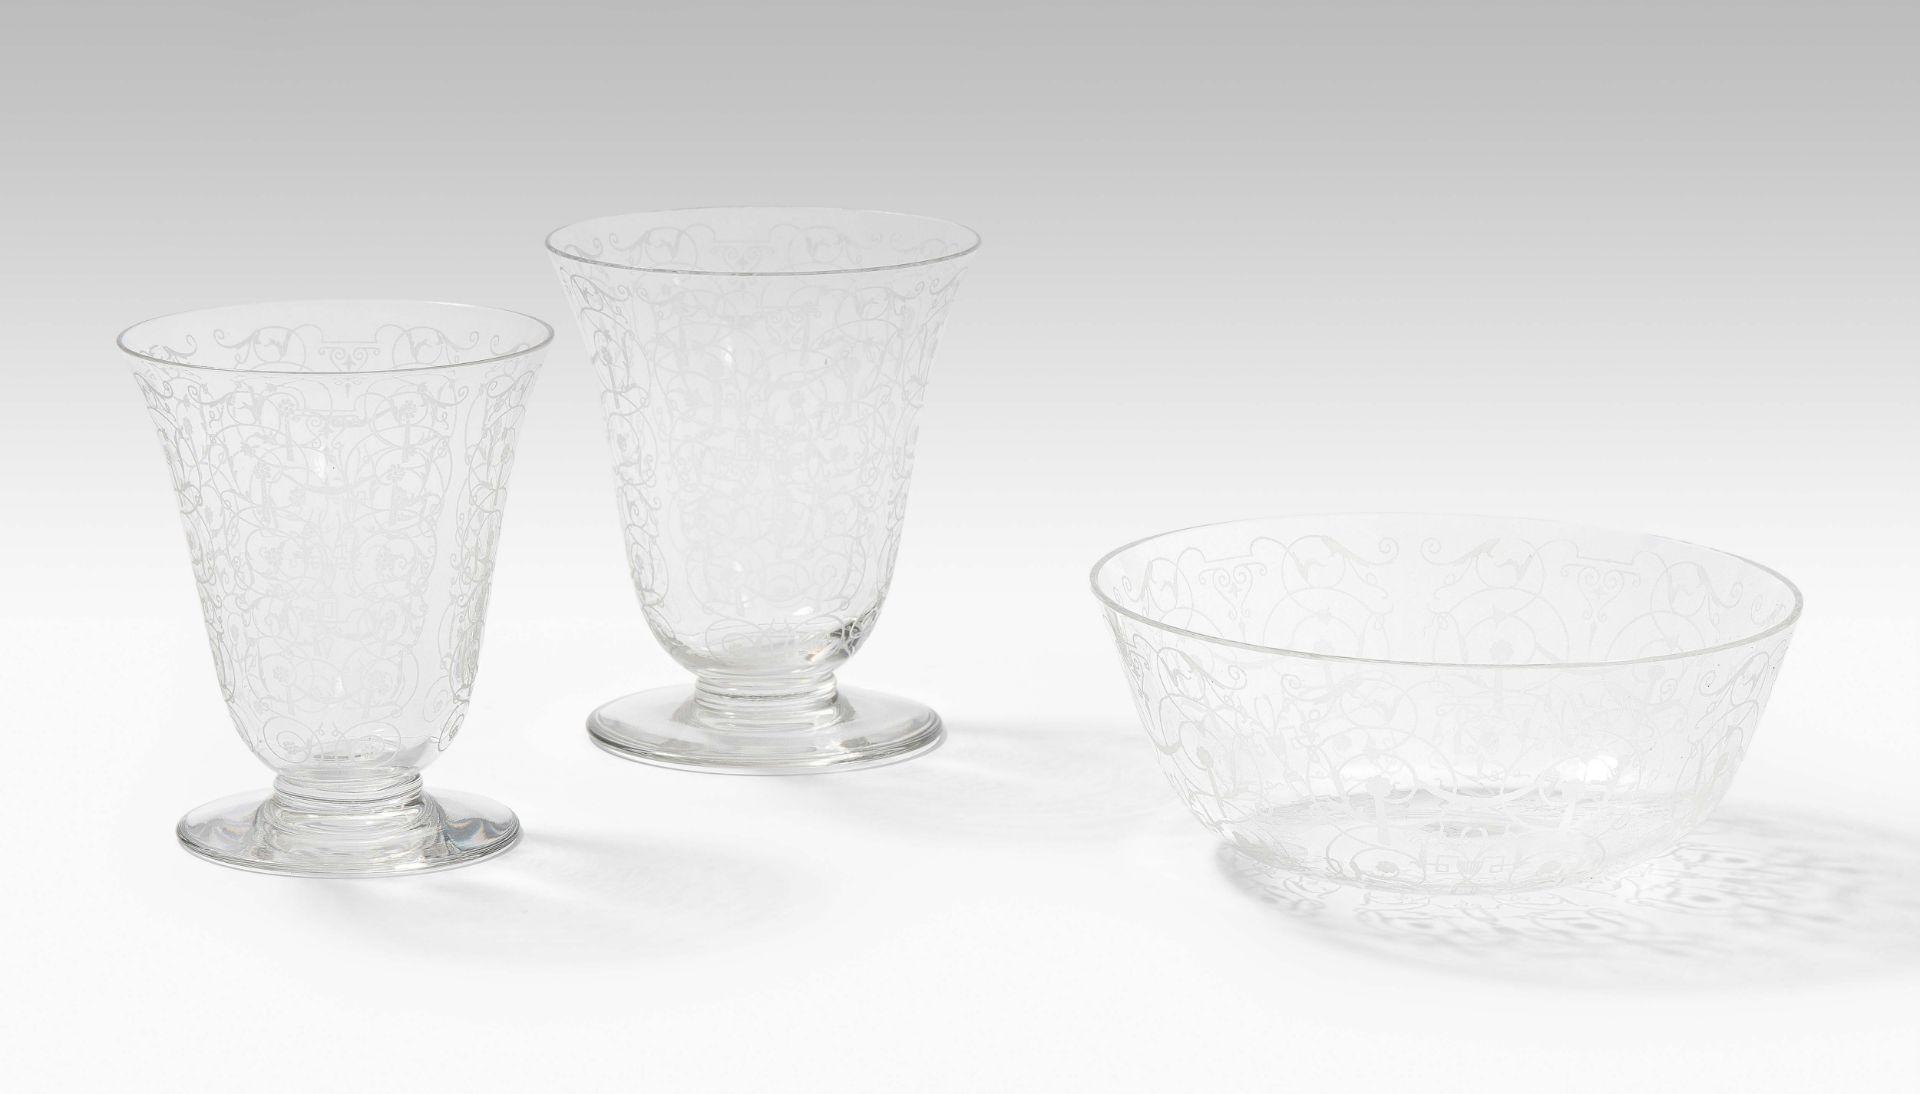 Baccarat, Gläserserviceteile